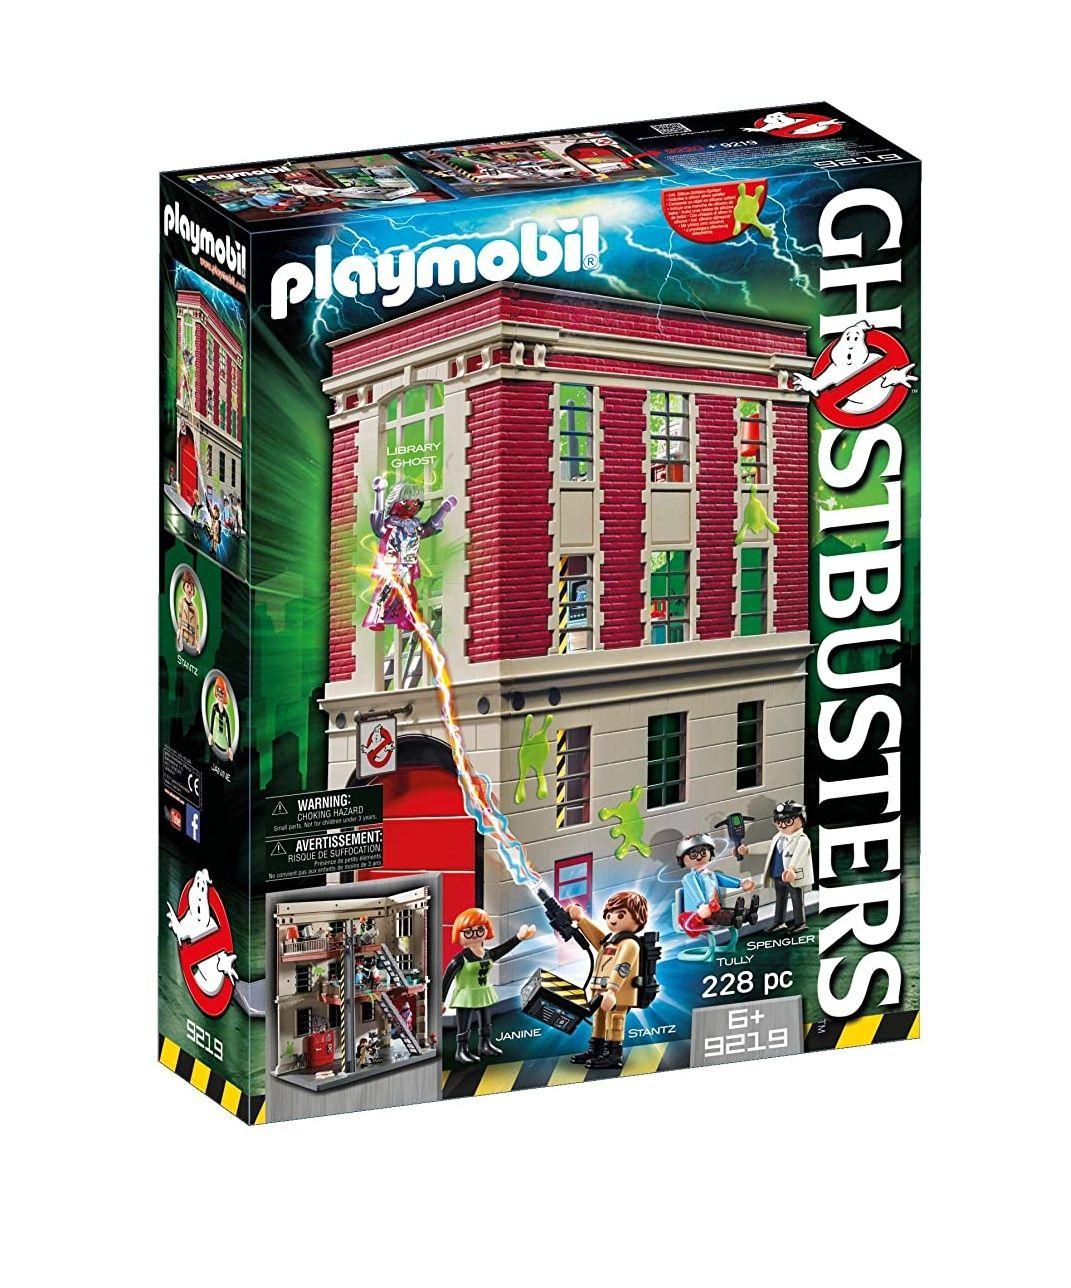 PLAYMOBIL 9219 Ghostbusters, Cuartel Parque de Bomberos, a